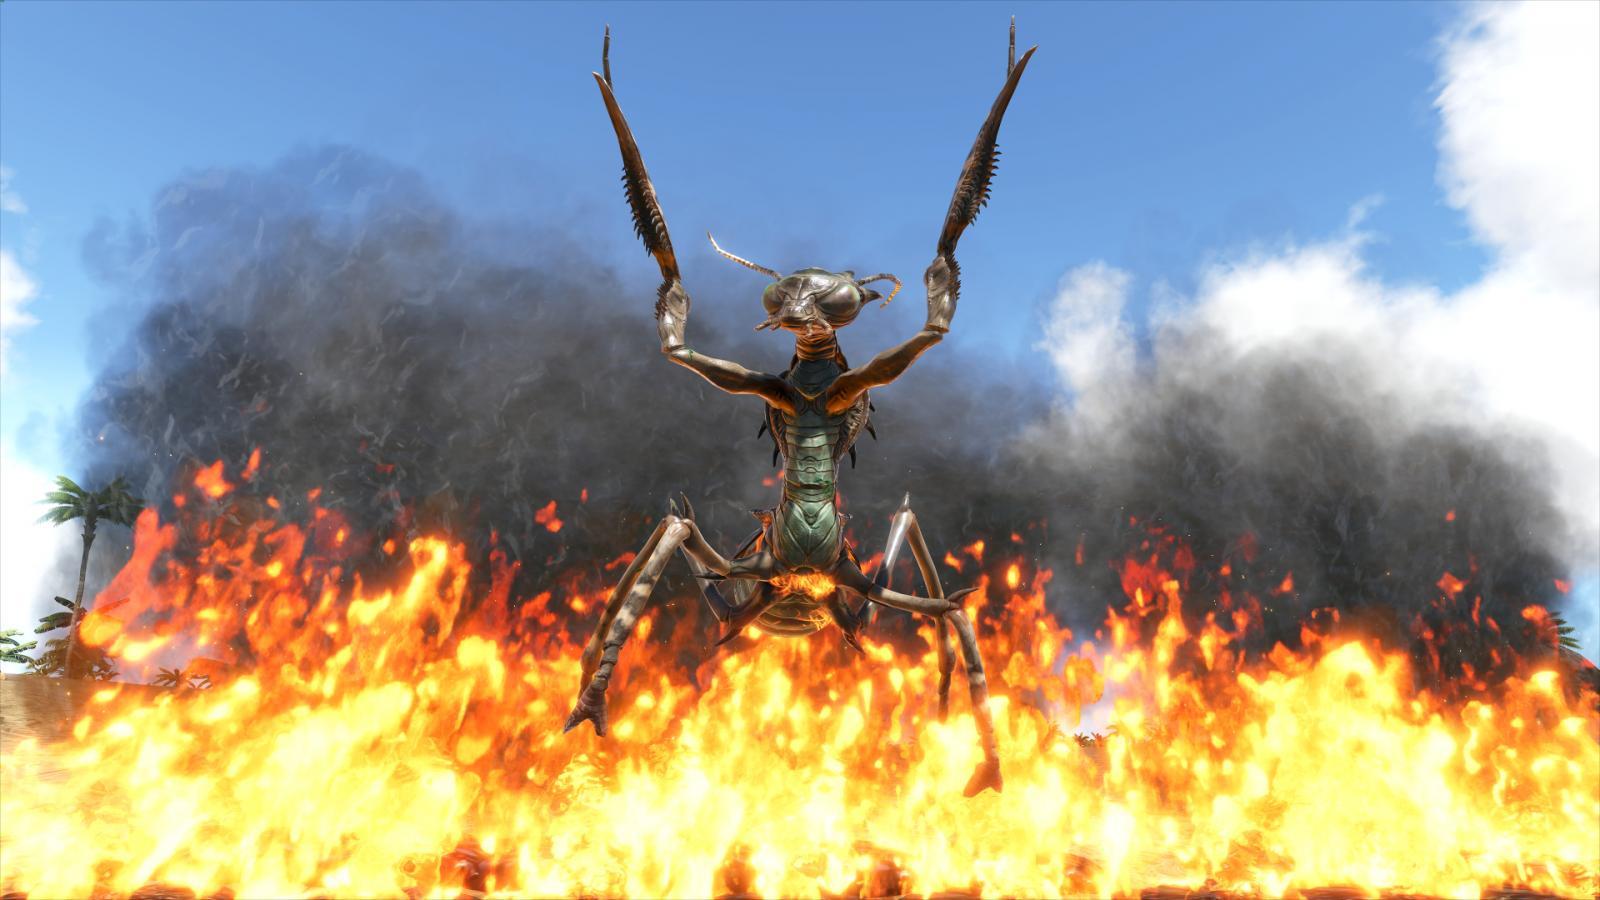 large.59848826d4fb8_Pollti-Mantis_on_fire-superresolution.jpg